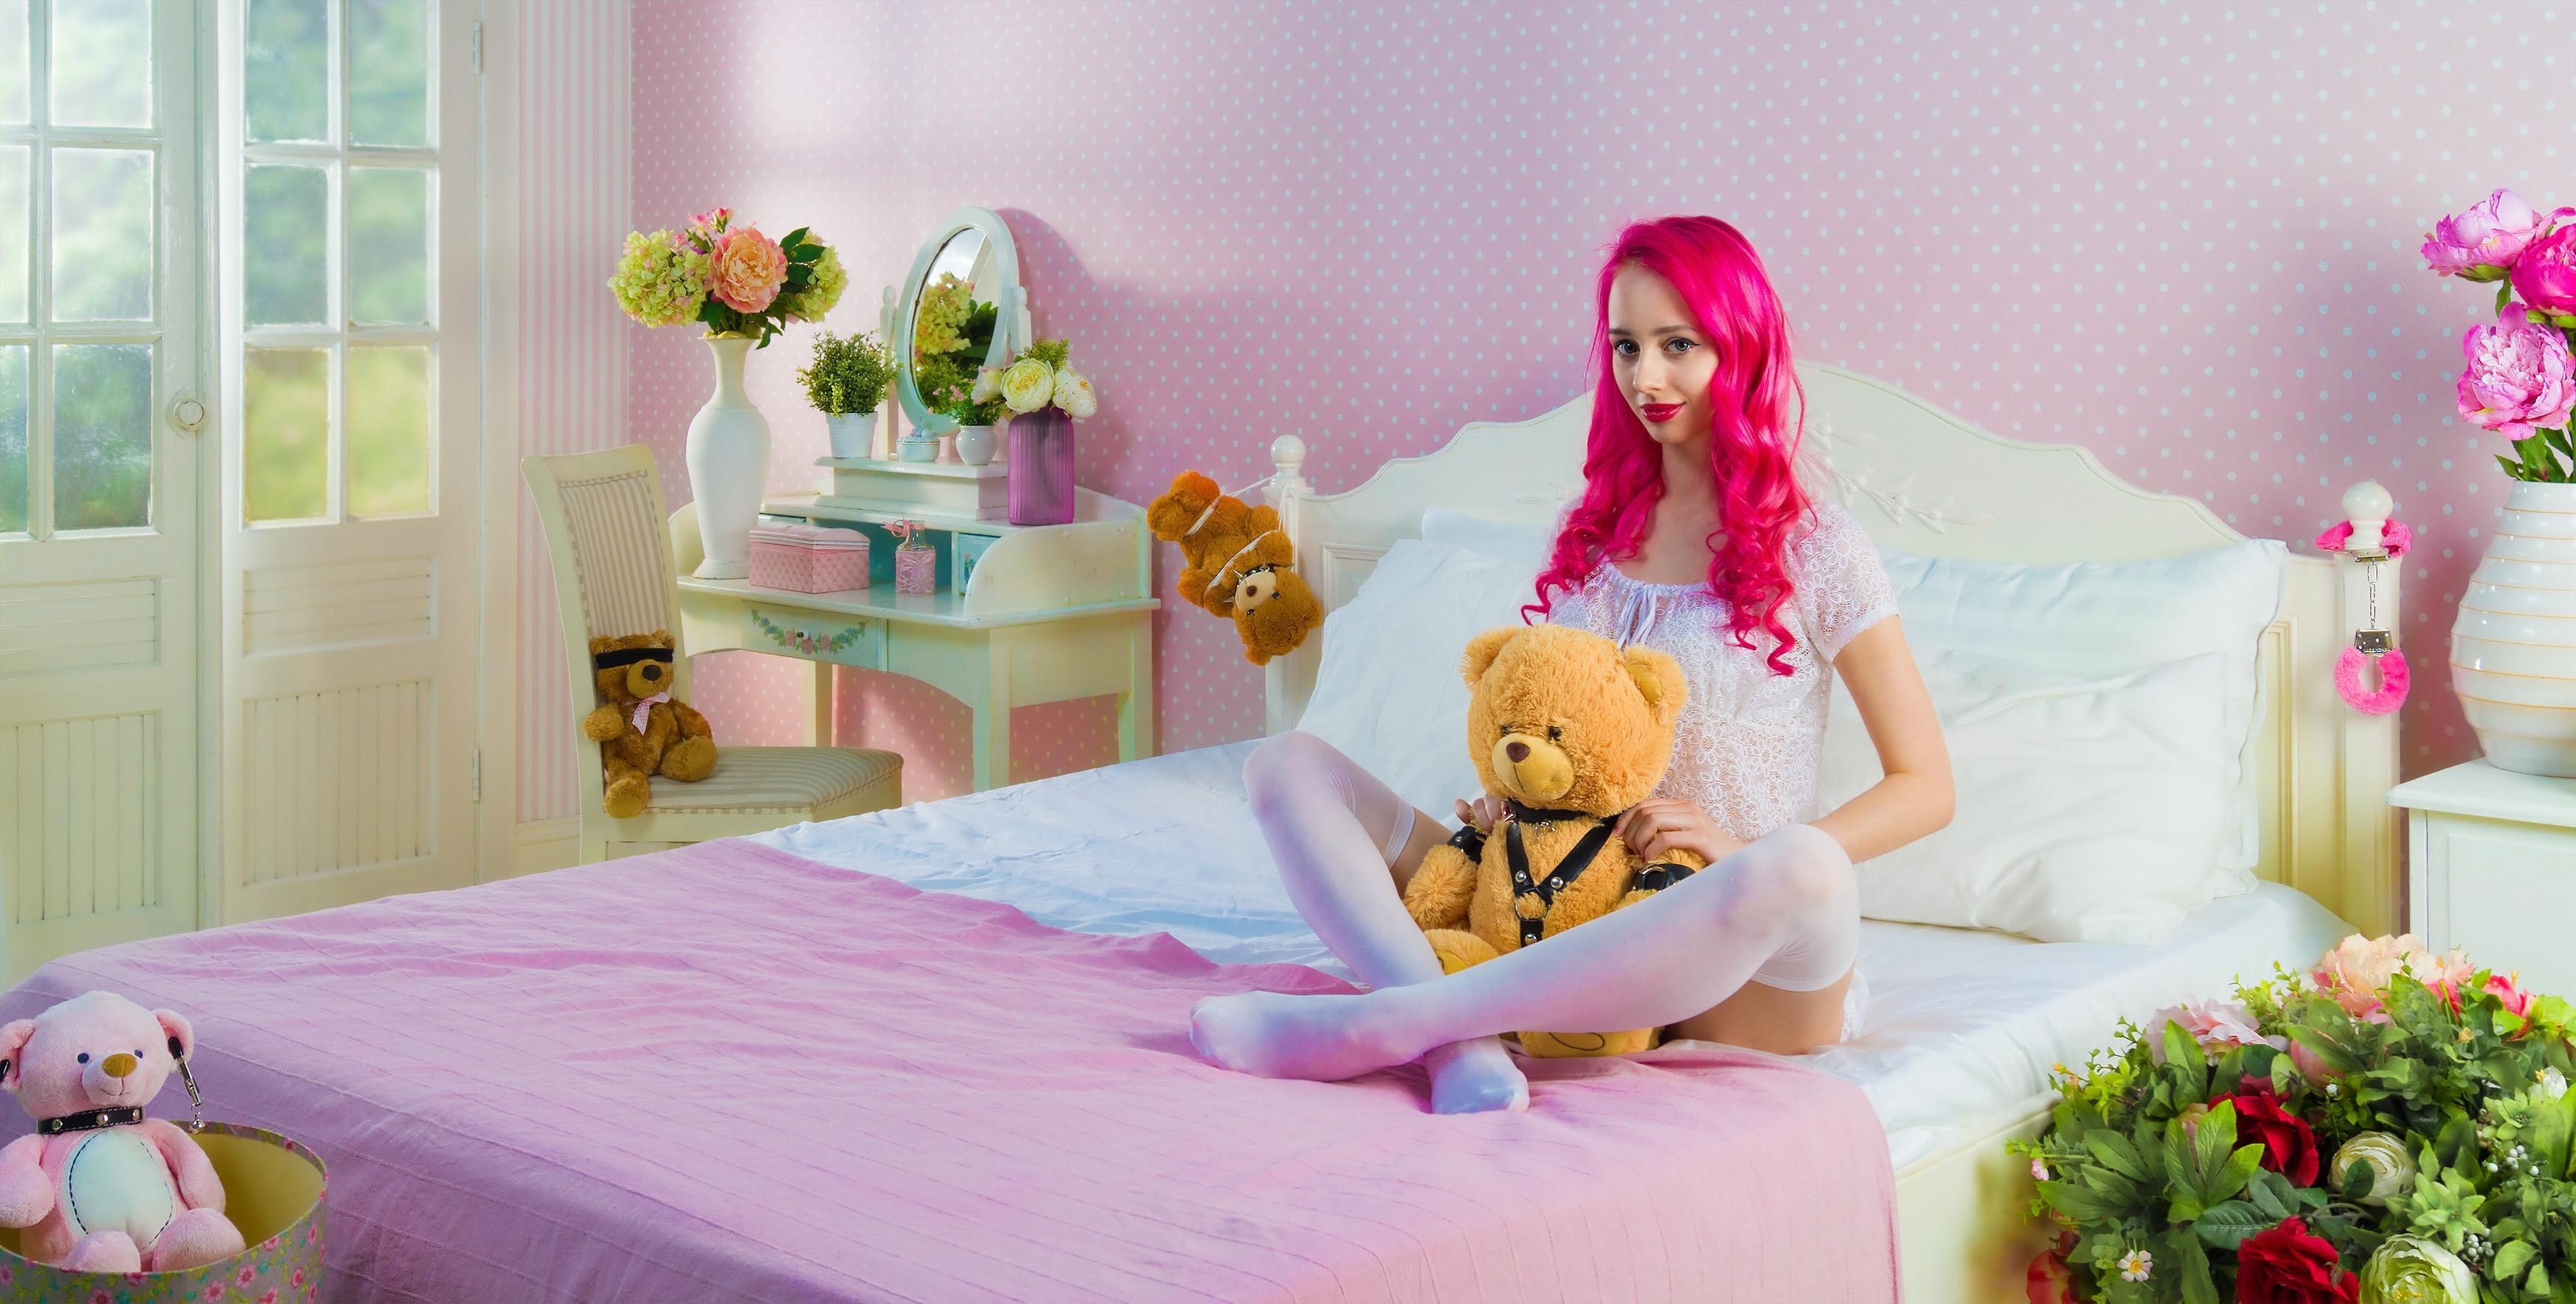 Обои комната, кровать, интерьер, мишка